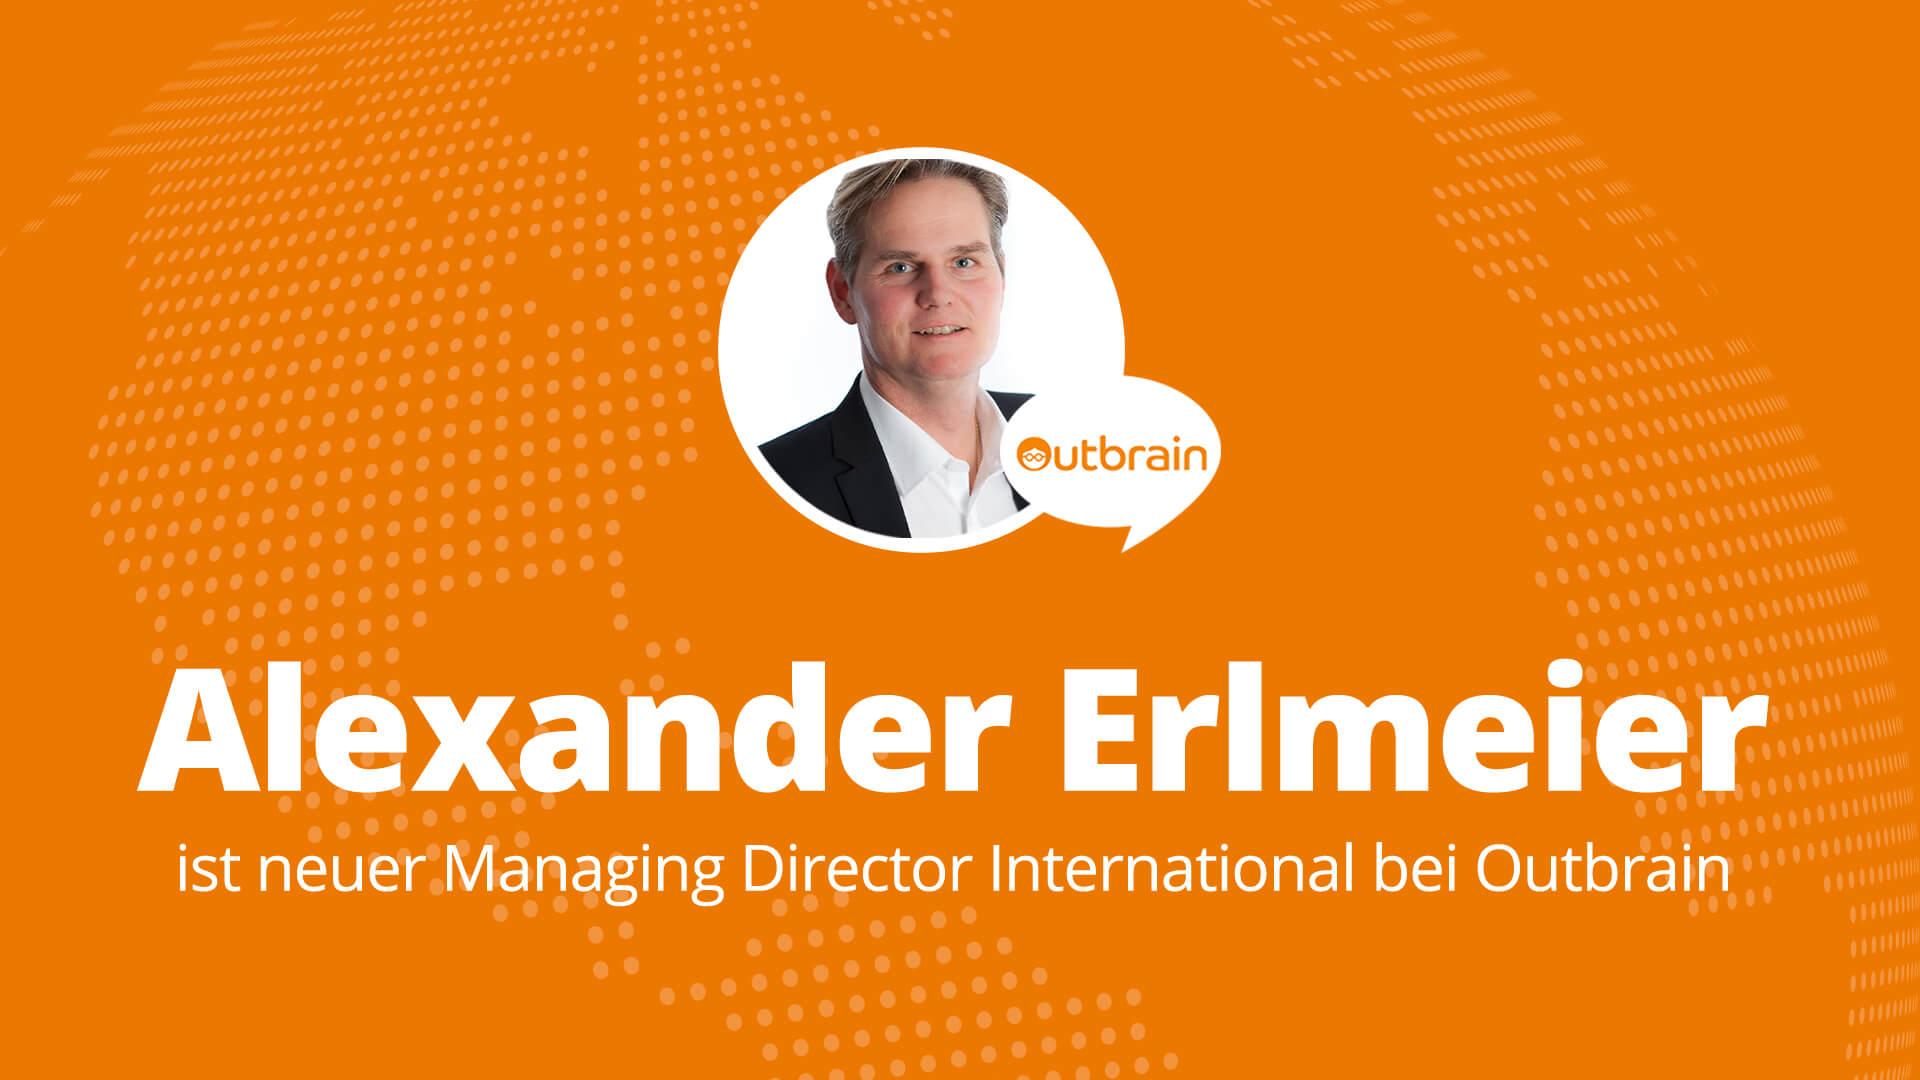 Alexander Erlmeier wird neuer Managing Director, International bei Outbrain